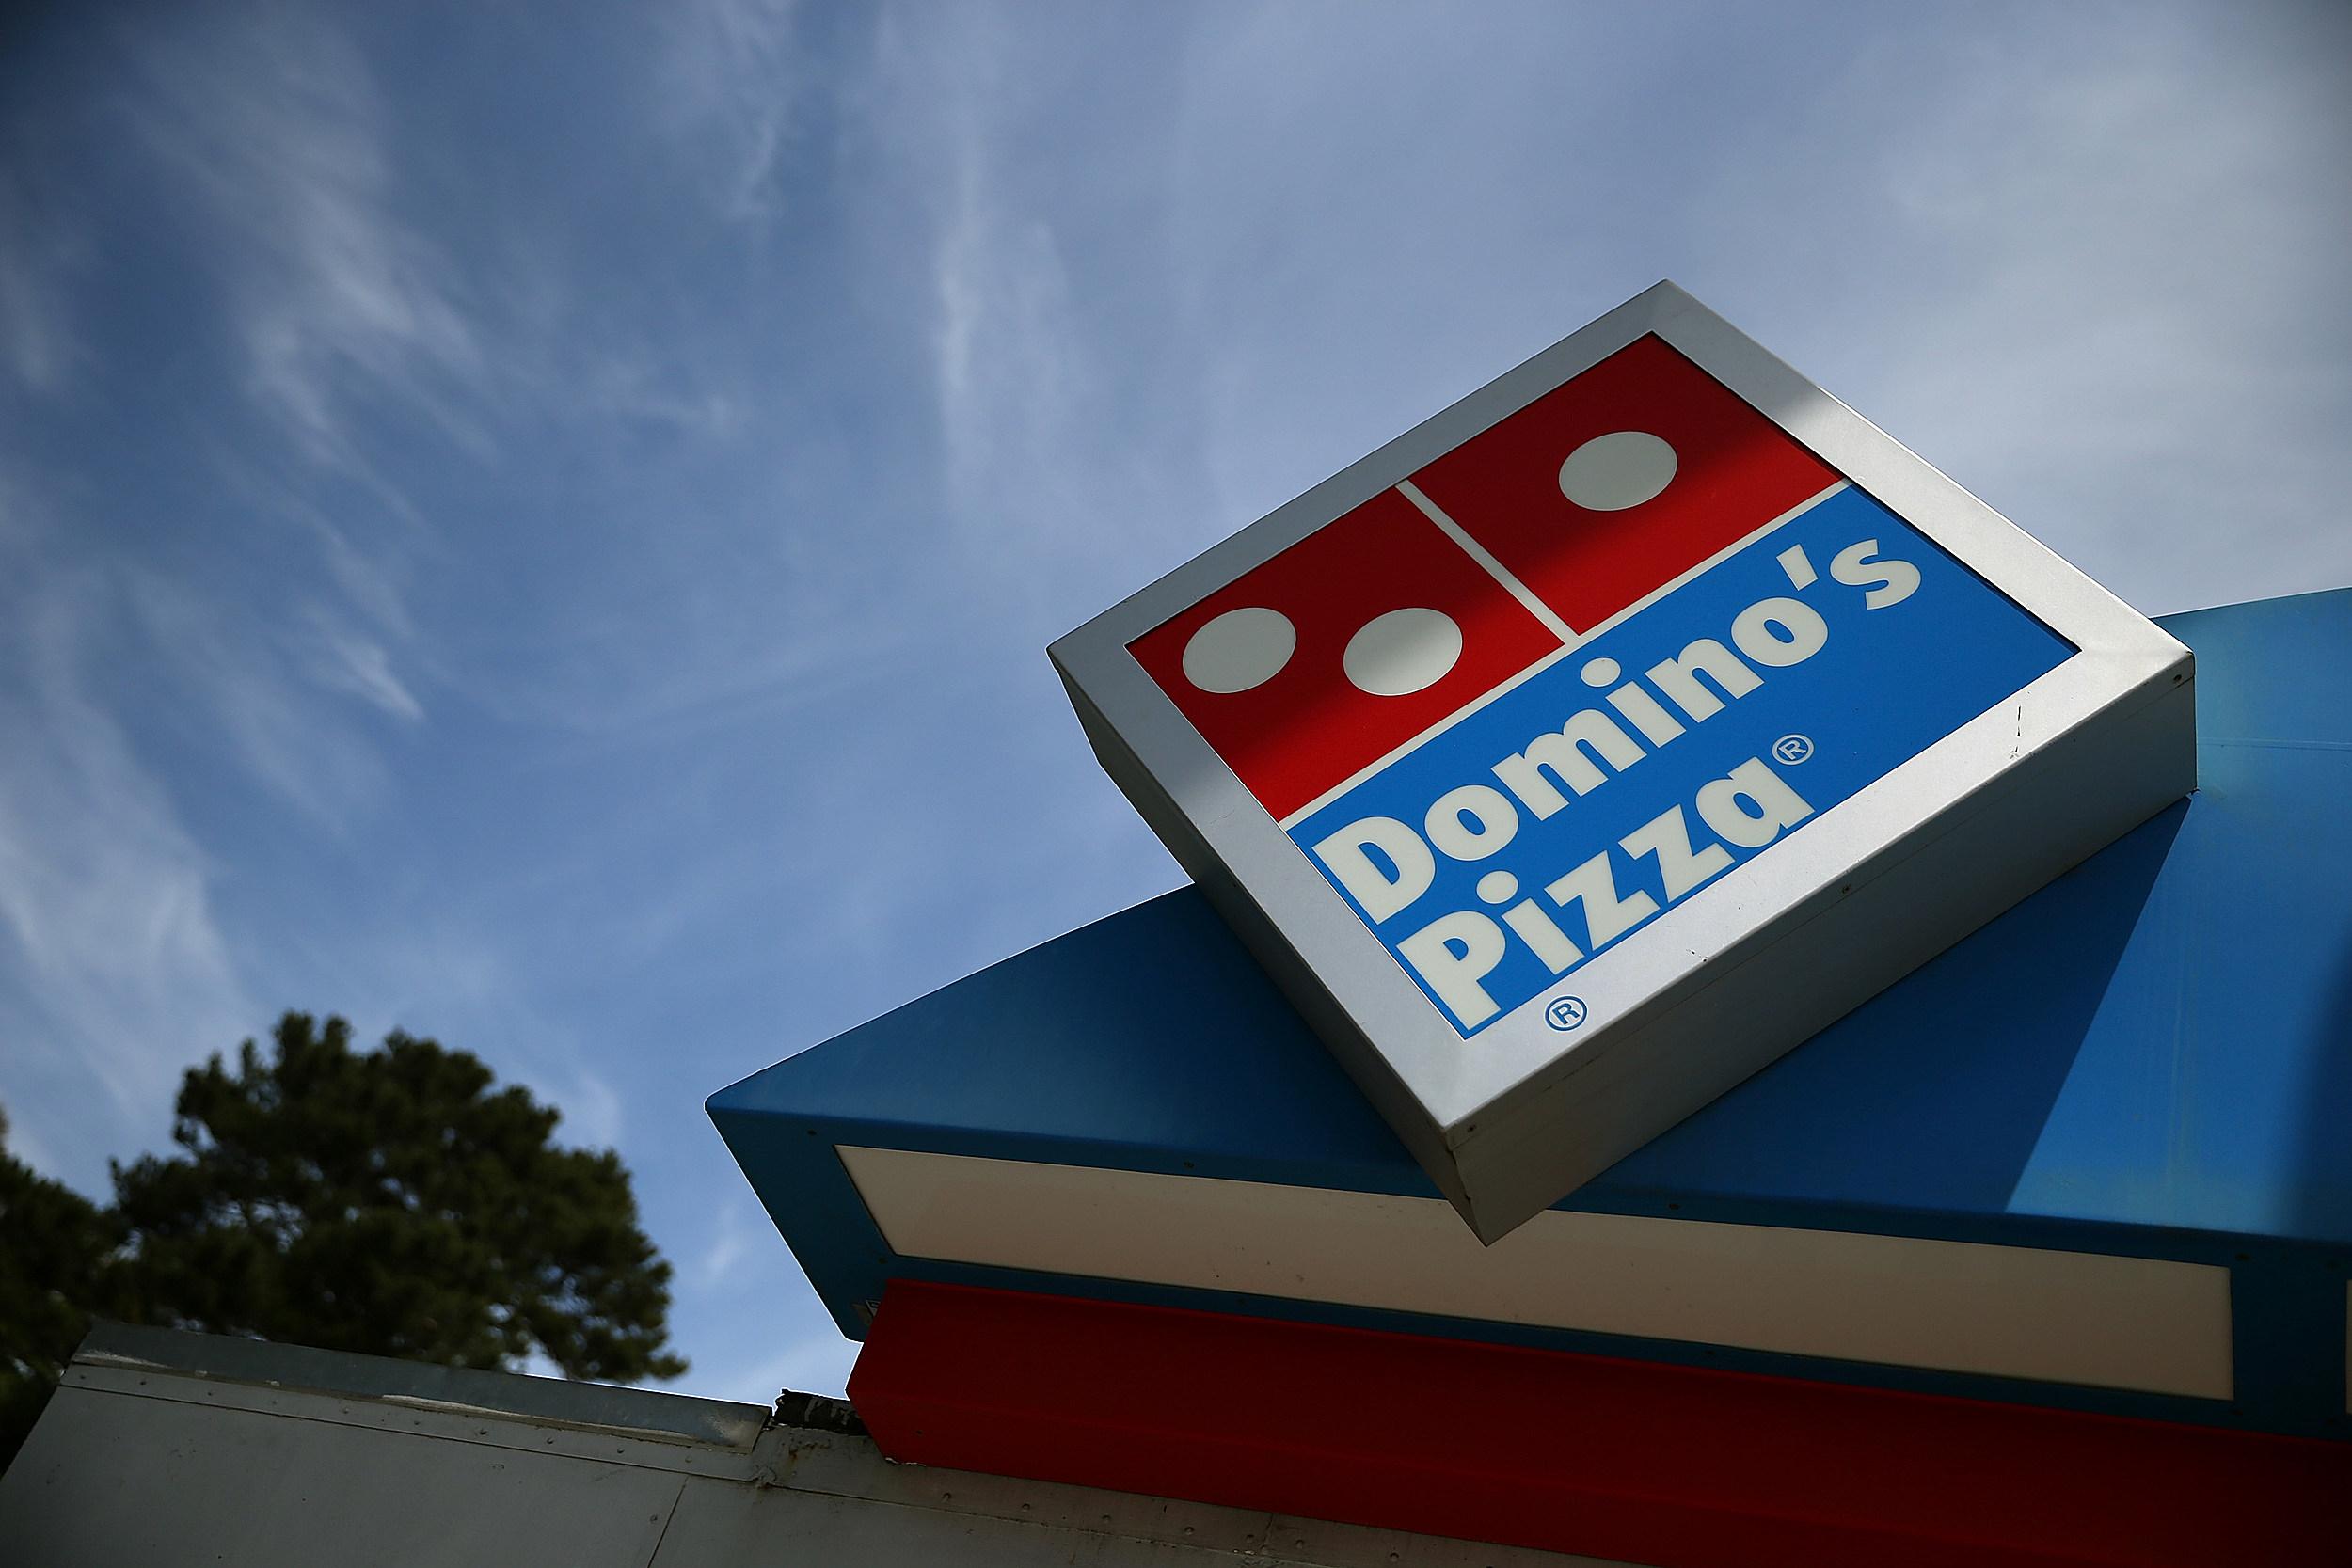 Domino's Reports Almost 20 Percent Increase In Quarterly Profits